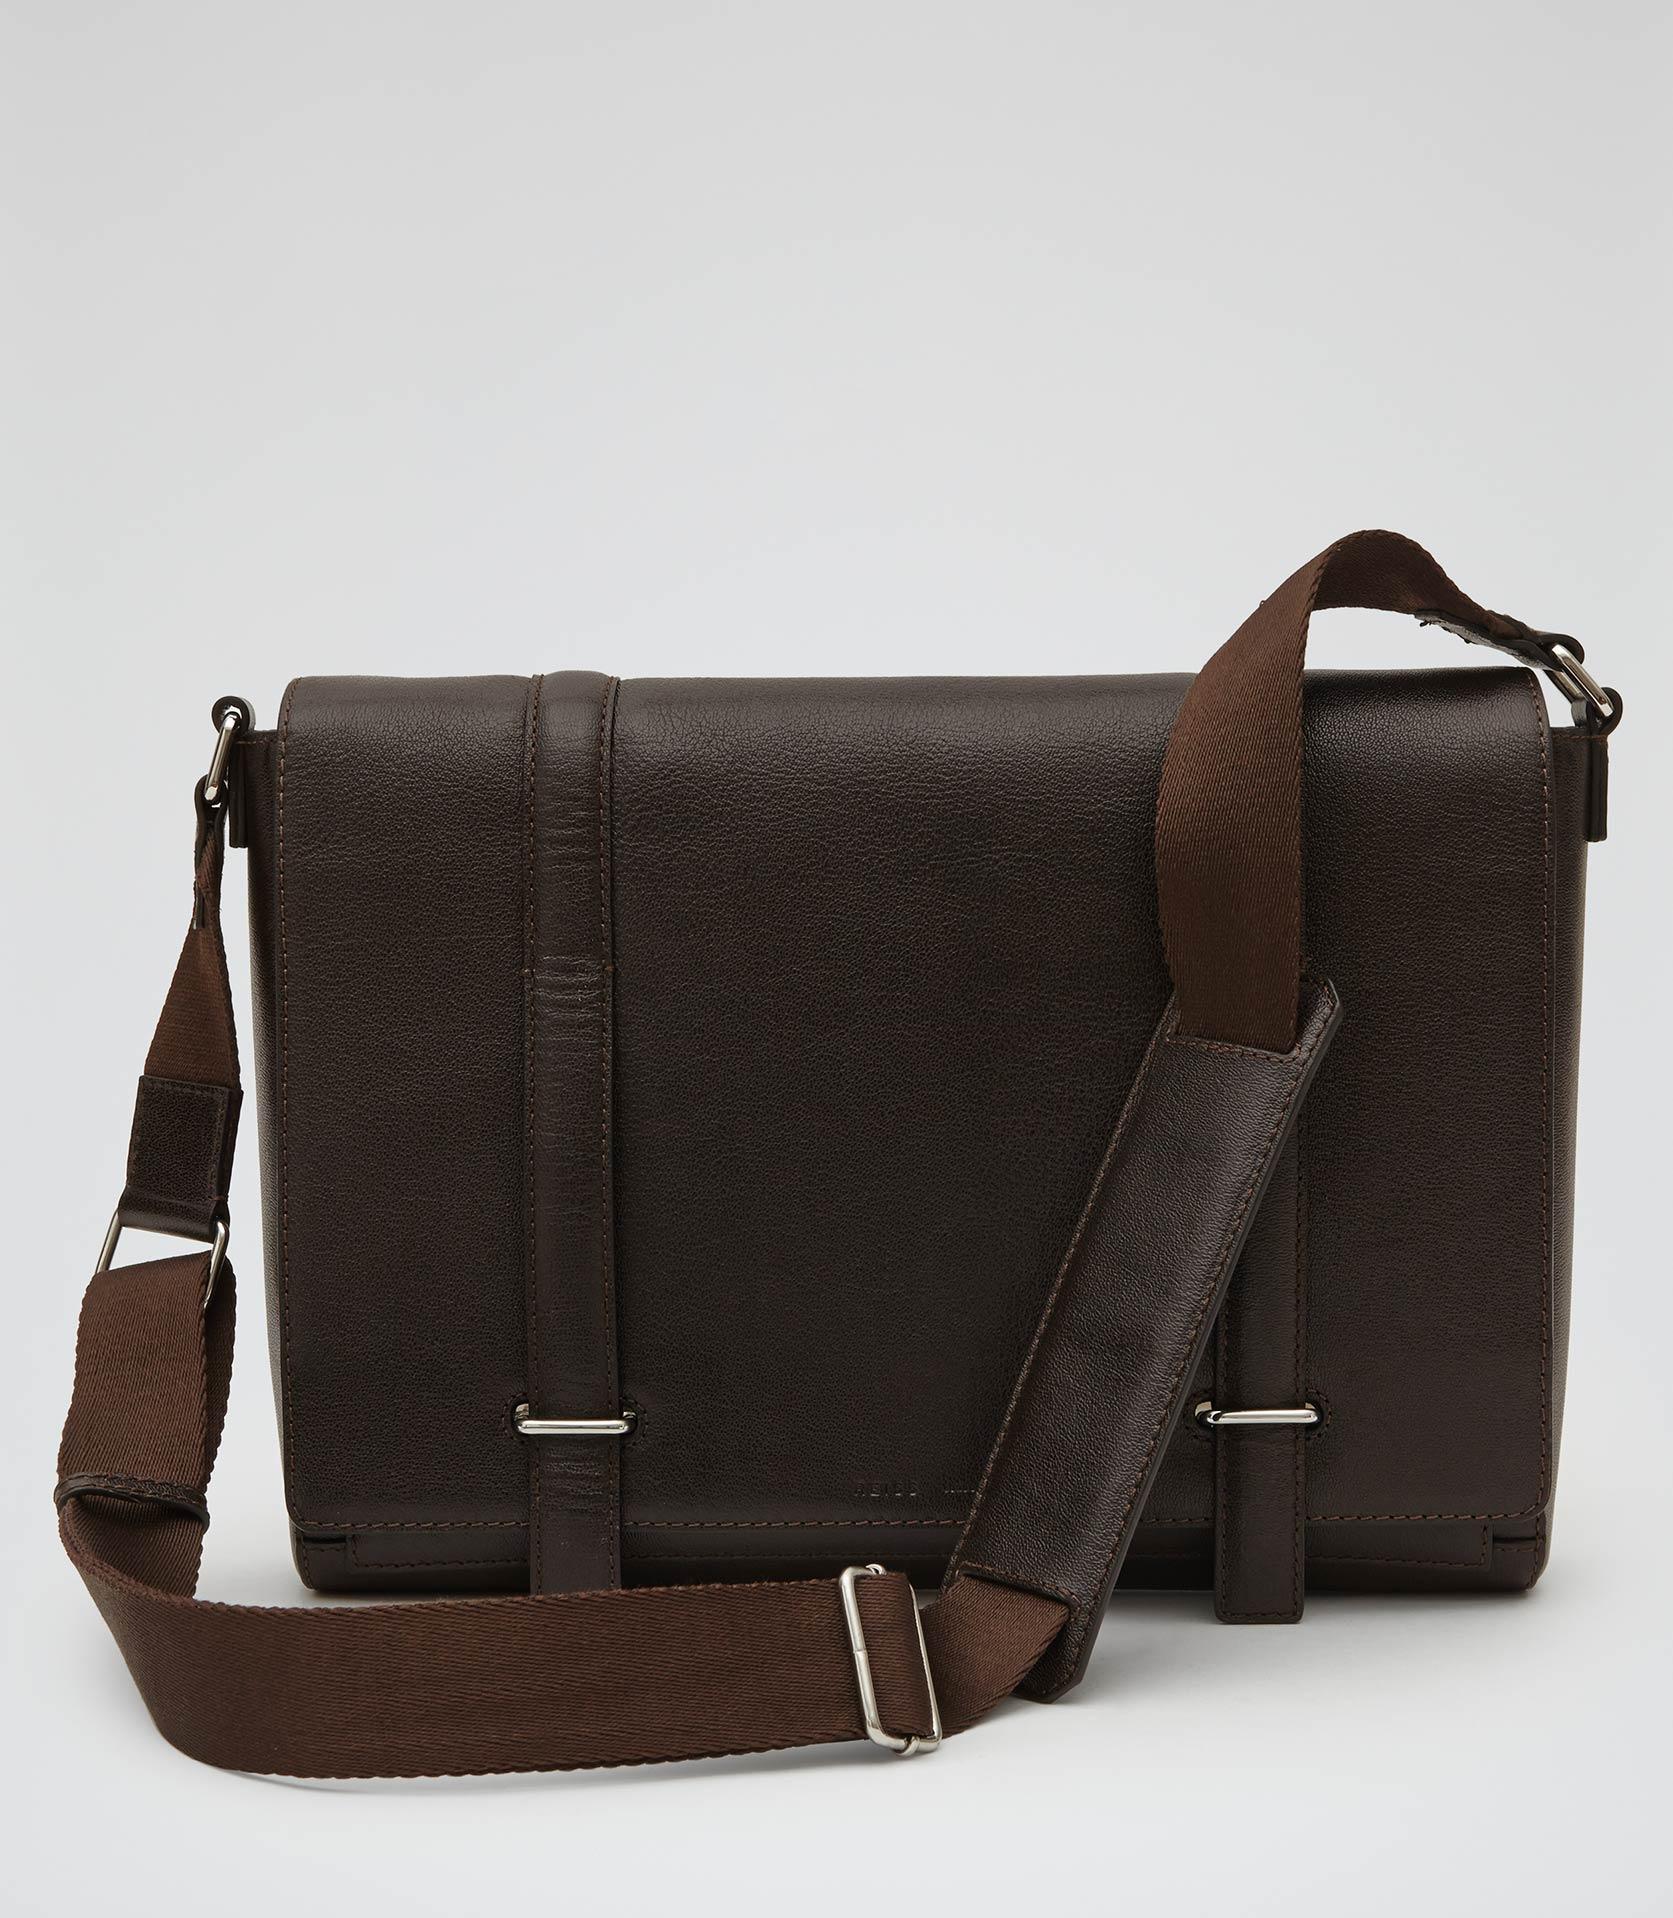 Reiss Salvatrucha Leather Messenger Bag in Brown for Men   Lyst